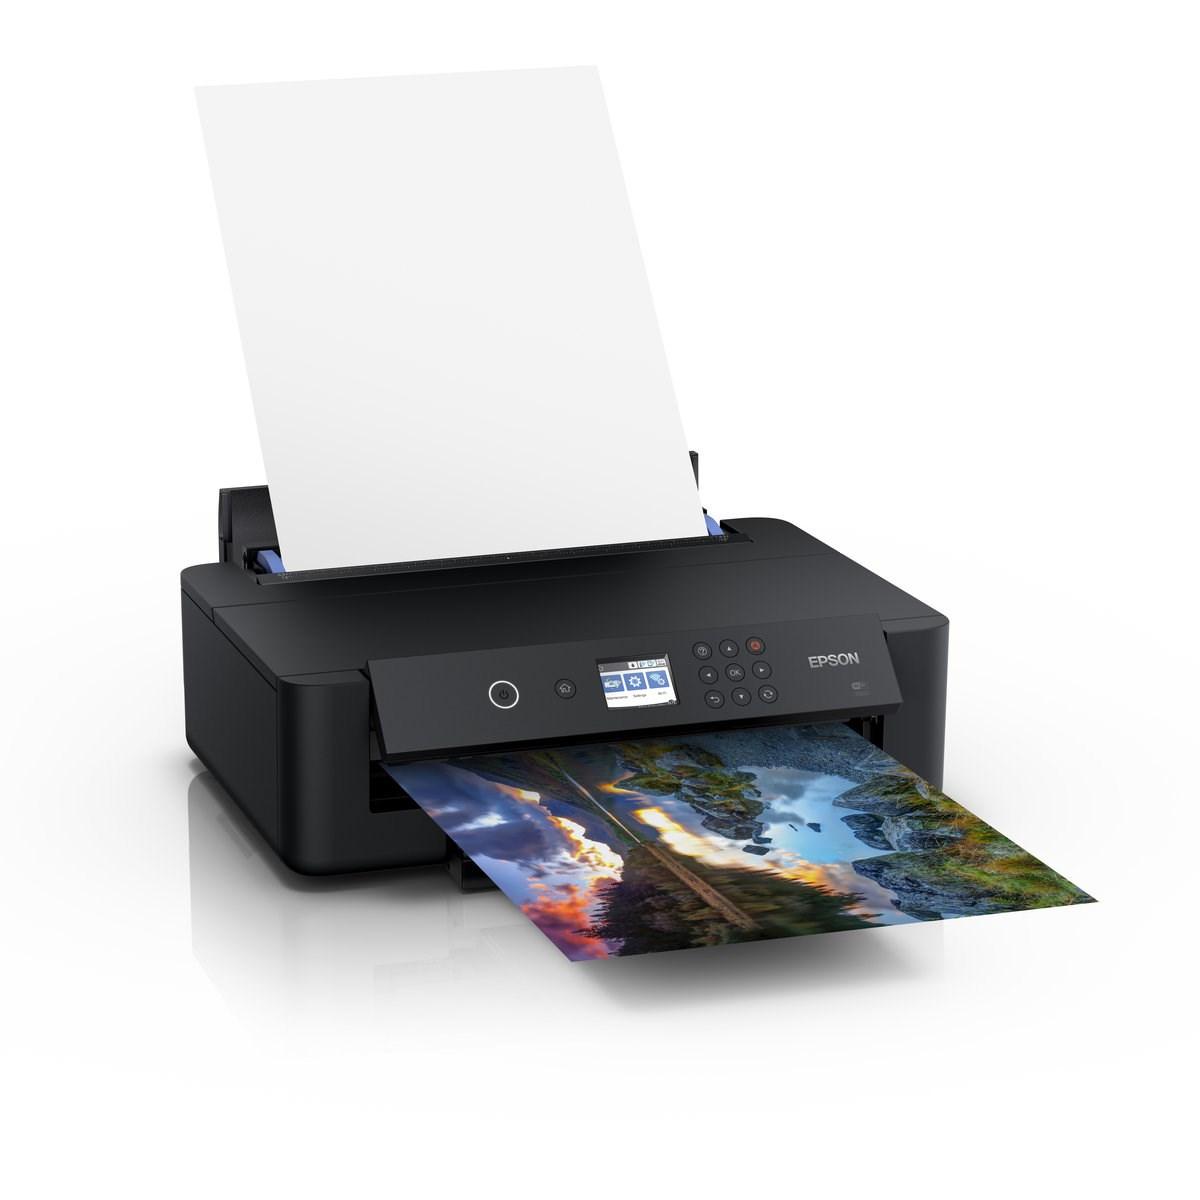 EPSON Tiskárna ink Expression Photo HD XP-15000, A3+ , 29ppm, duplex, WIFI, USB, Ethernet